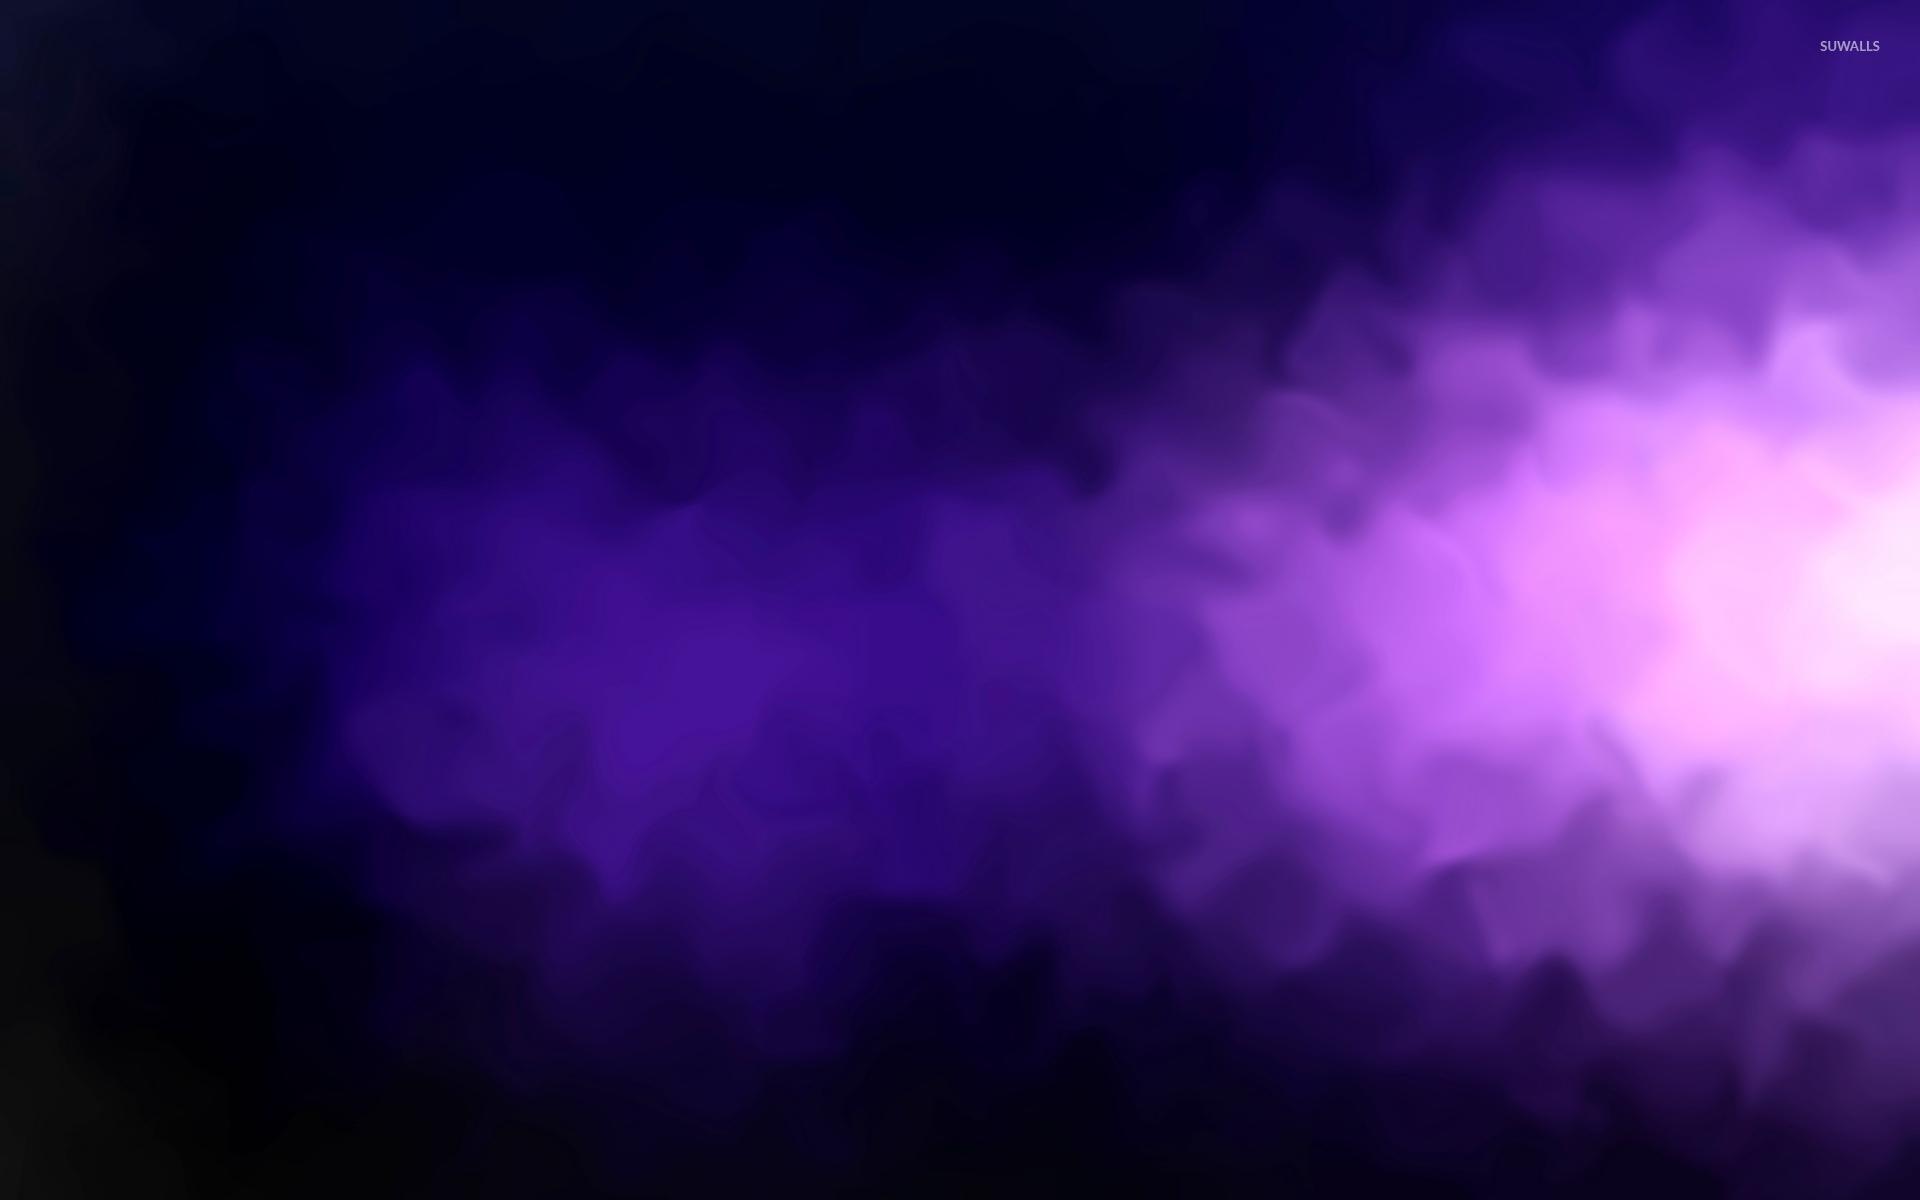 purple smoke [4] wallpaper - abstract wallpapers - #26993